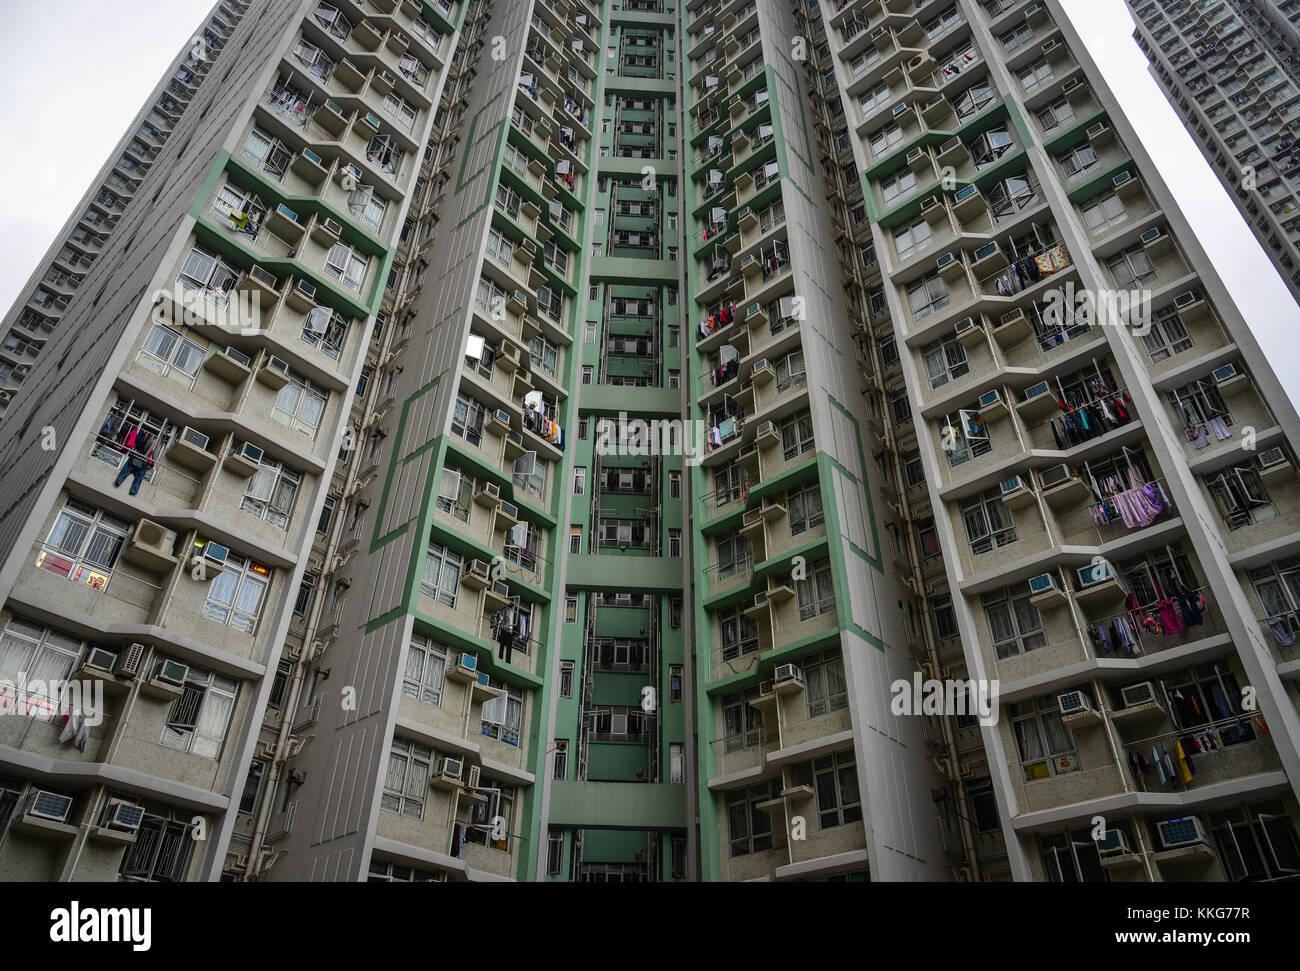 Urbanisation Hong Kong Stockfotos & Urbanisation Hong Kong Bilder ...